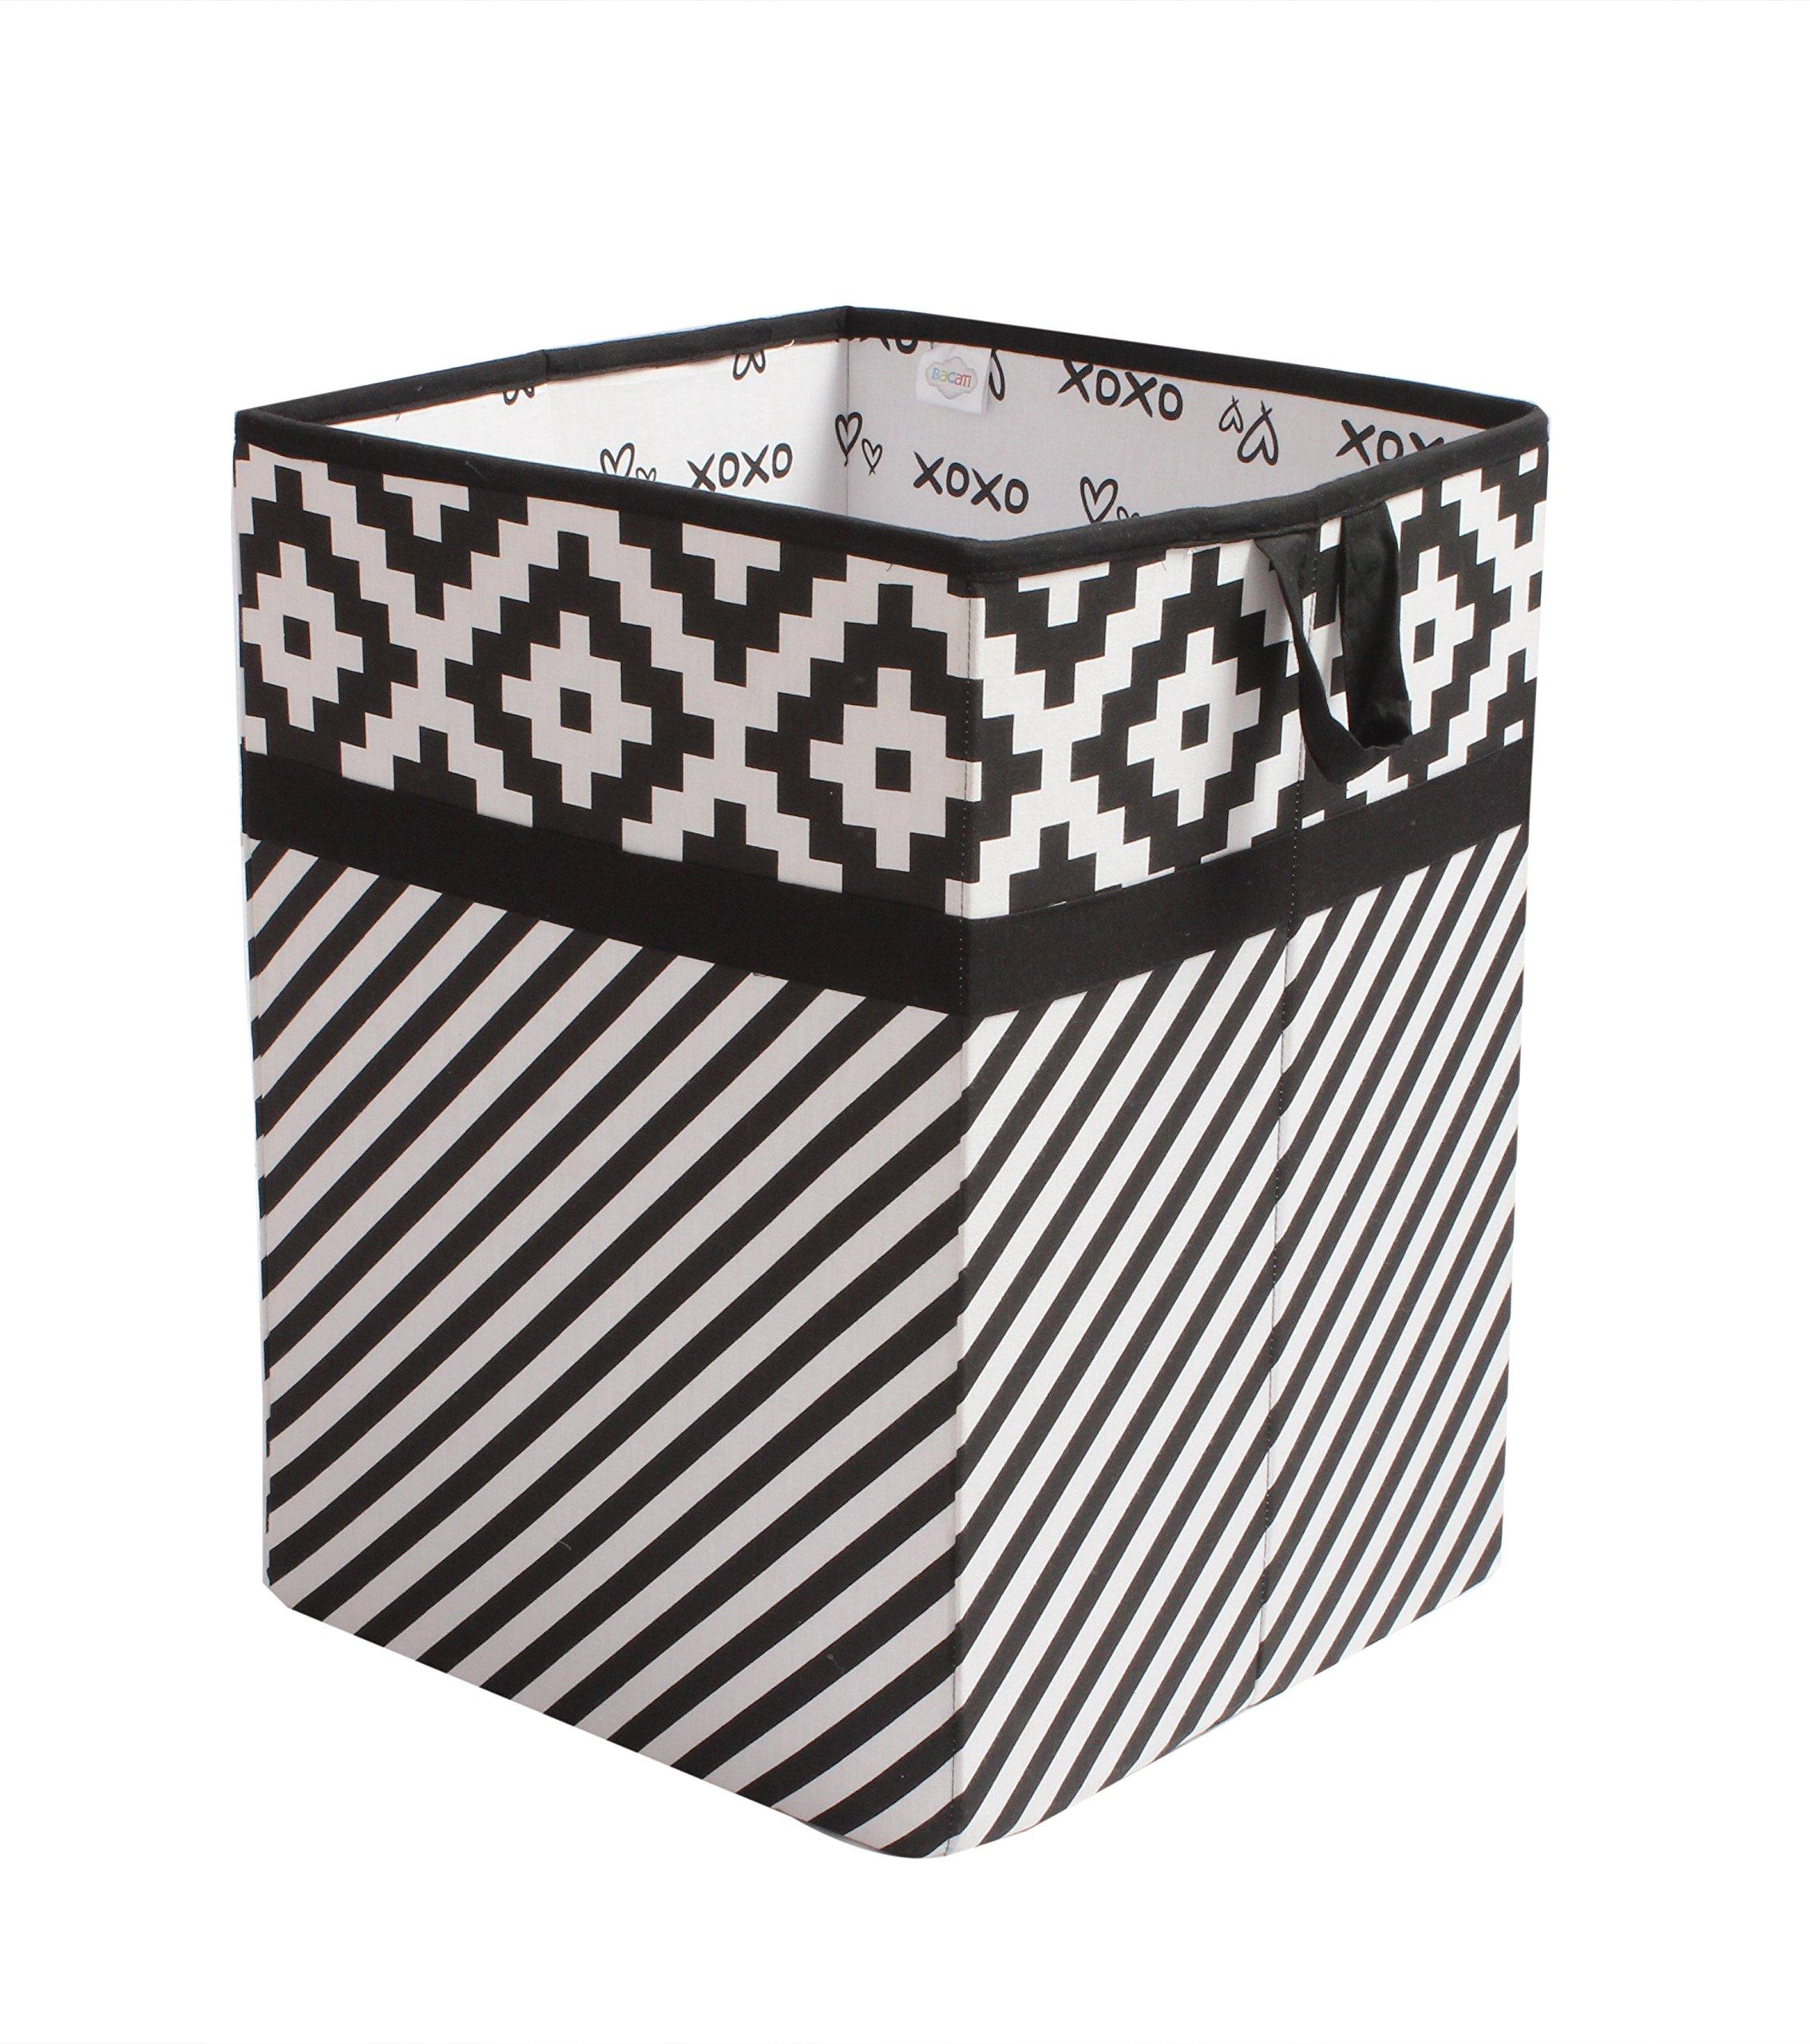 Bacati Love Fabric Collapsible Hamper, Black/white, 14'' x 14'' x 19''